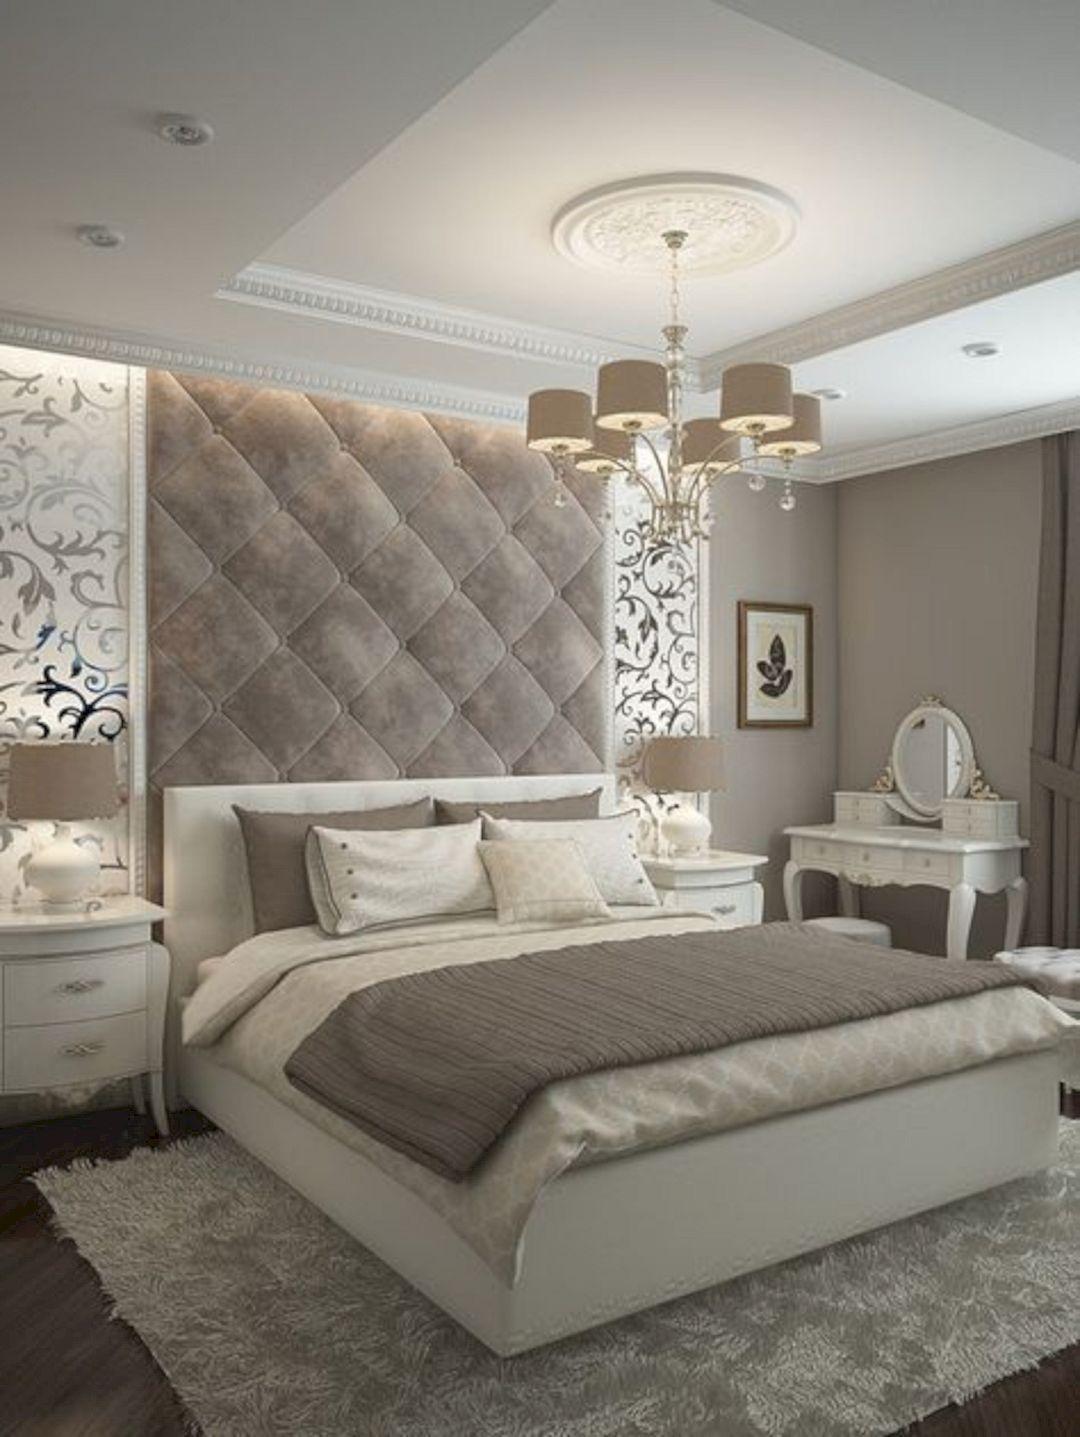 Elegant Bedroom Design New Elegant Bedroom Designs 6  Decorating Ideas  Pinterest  Elegant Design Decoration